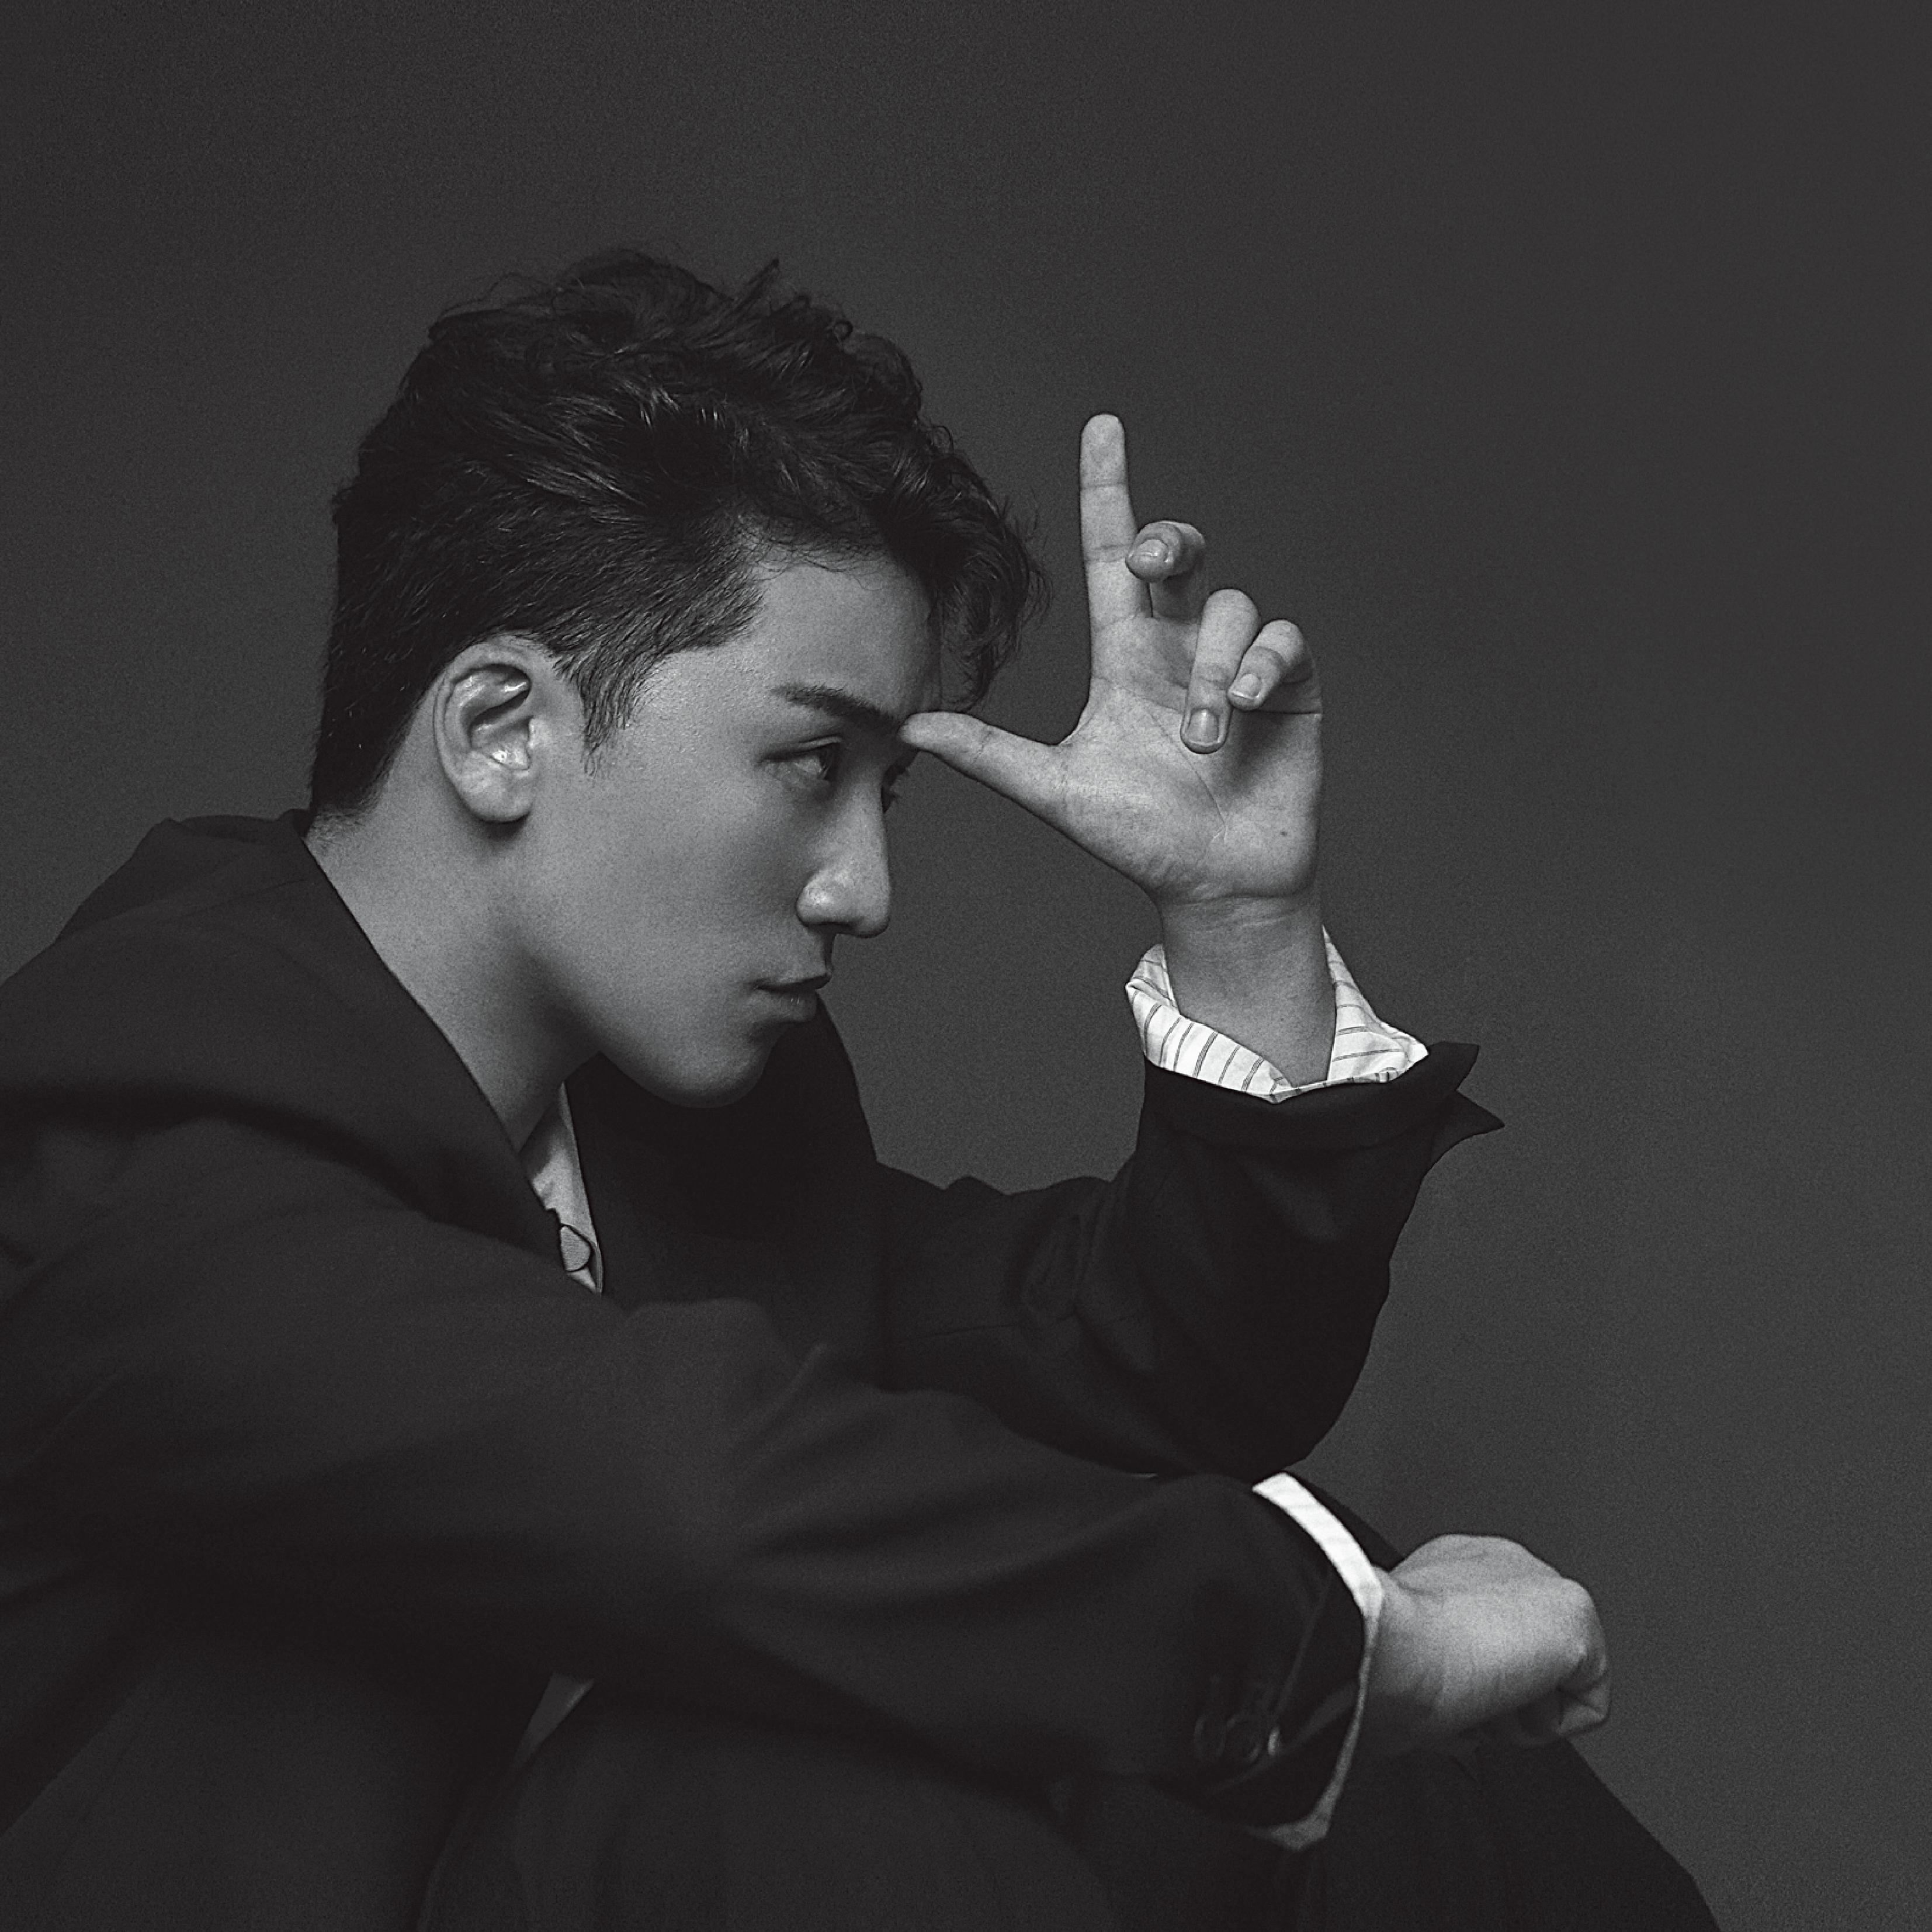 Yong Jun-hyung admits to watching illicit sex videos